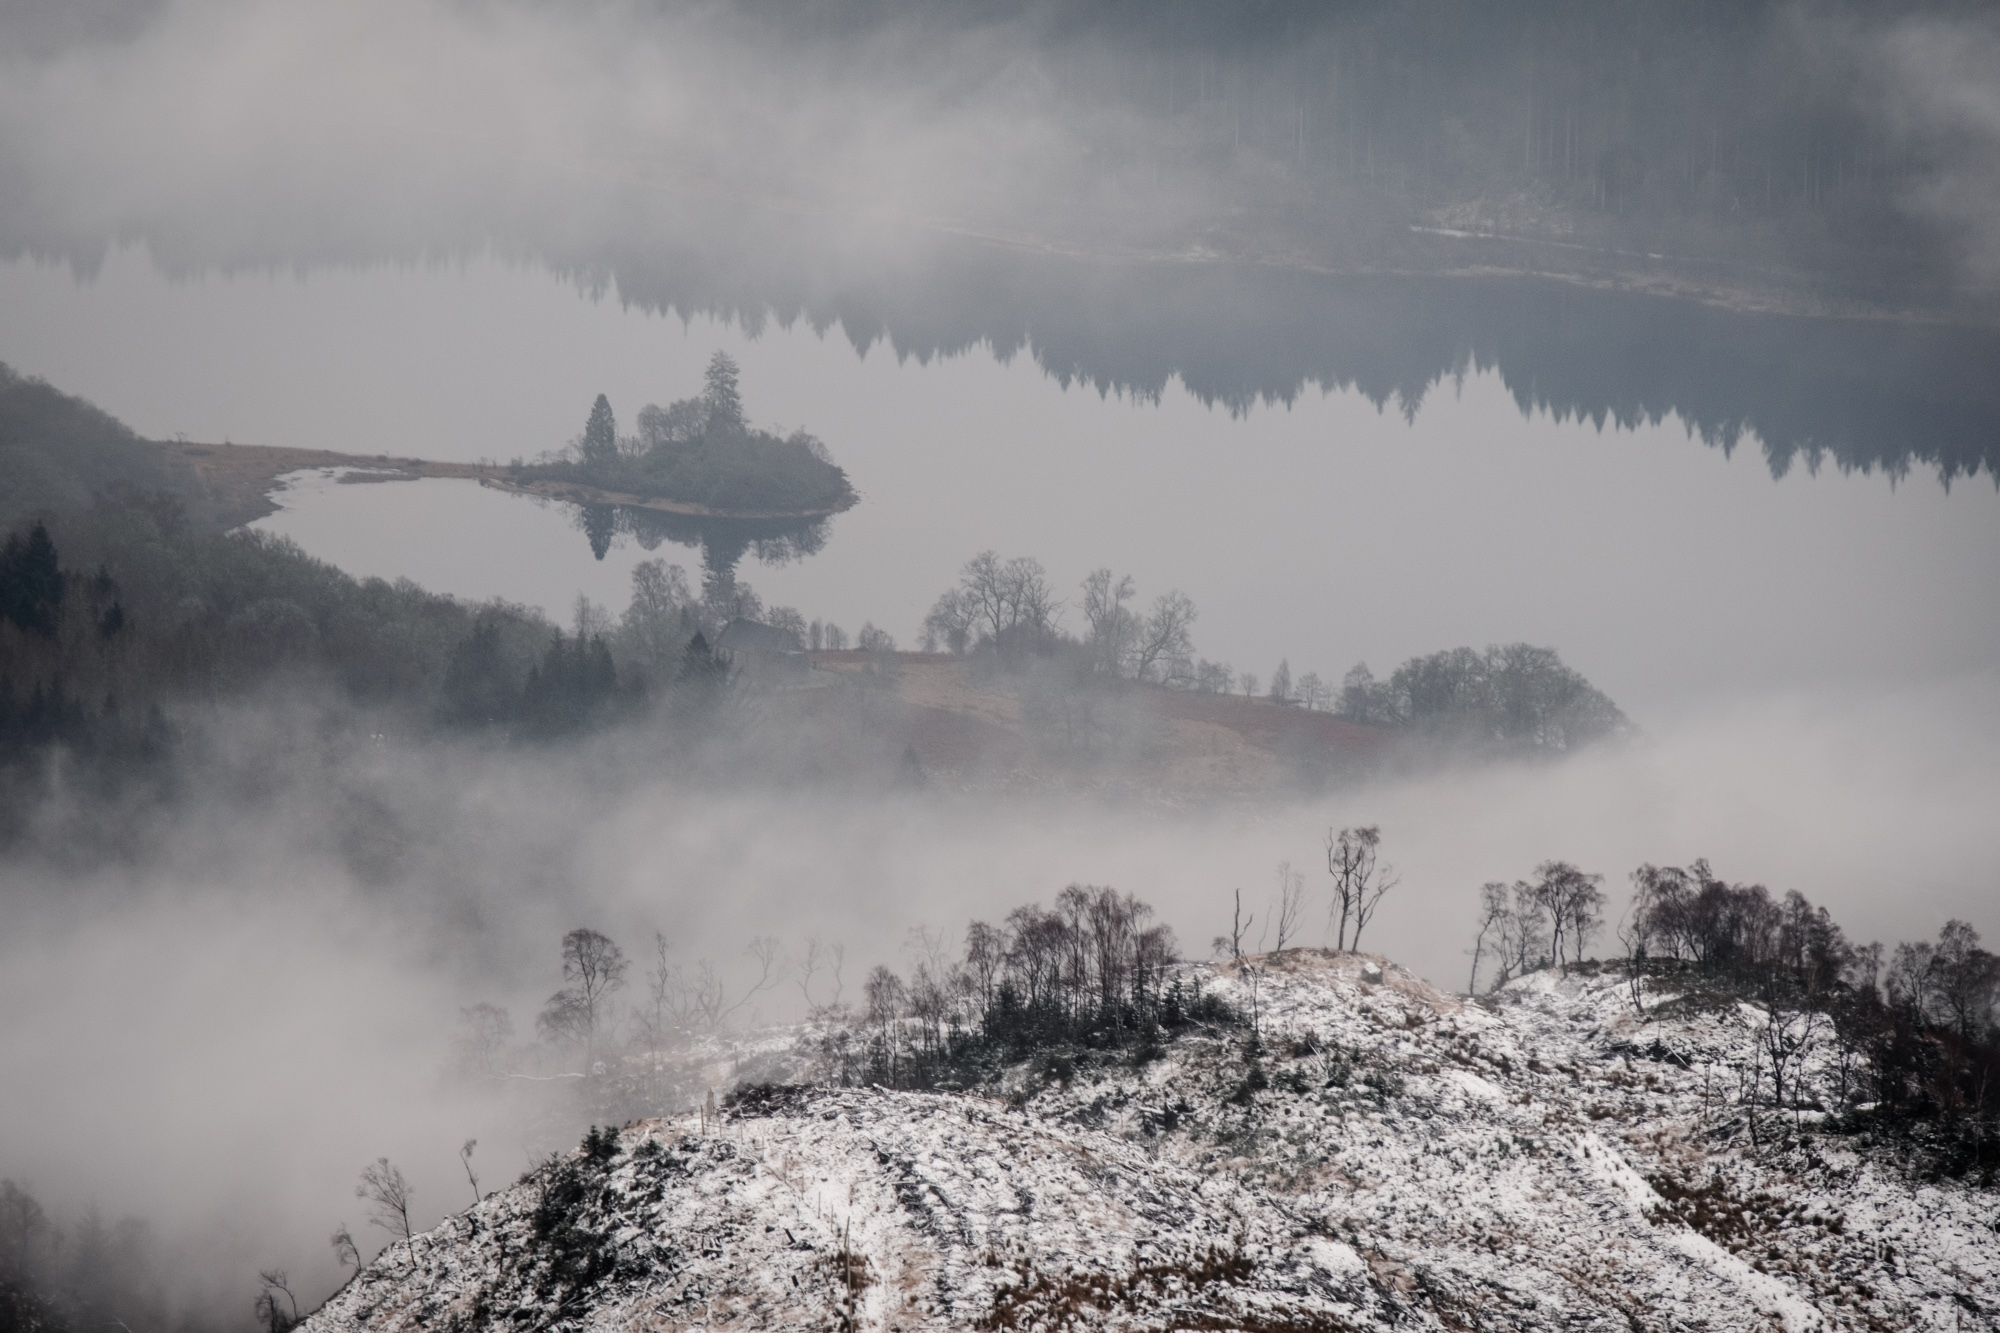 Loch Katrine from above